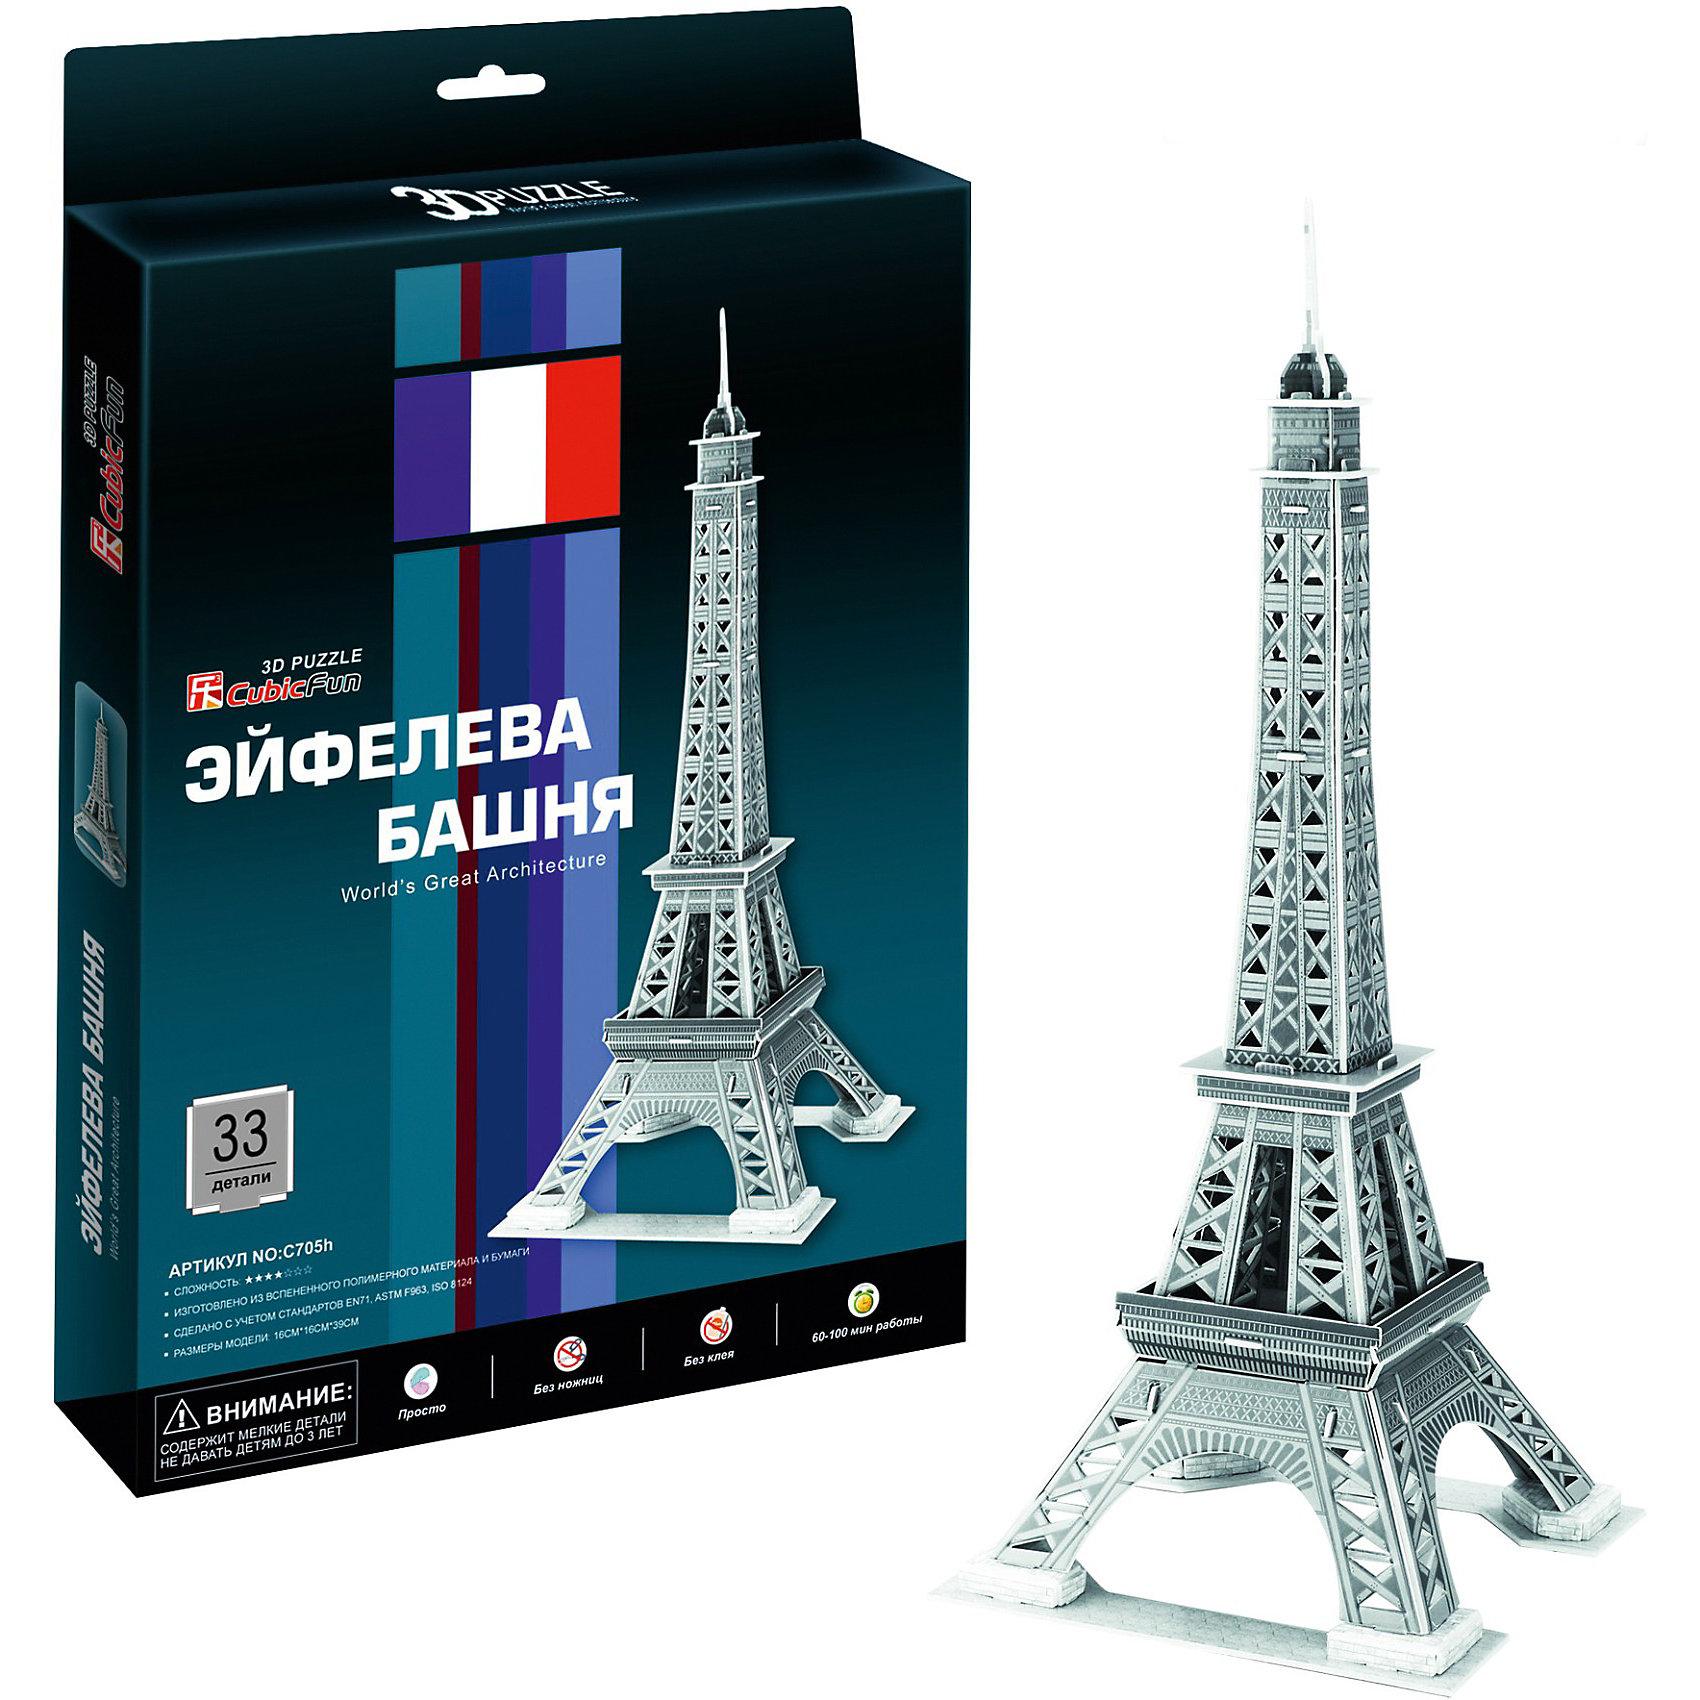 CubicFun Пазл 3D Эйфелева Башня 2 (Париж), 33 детали, CubicFun cubicfun 3d пазл эйфелева башня 2 франция cubicfun 33 детали